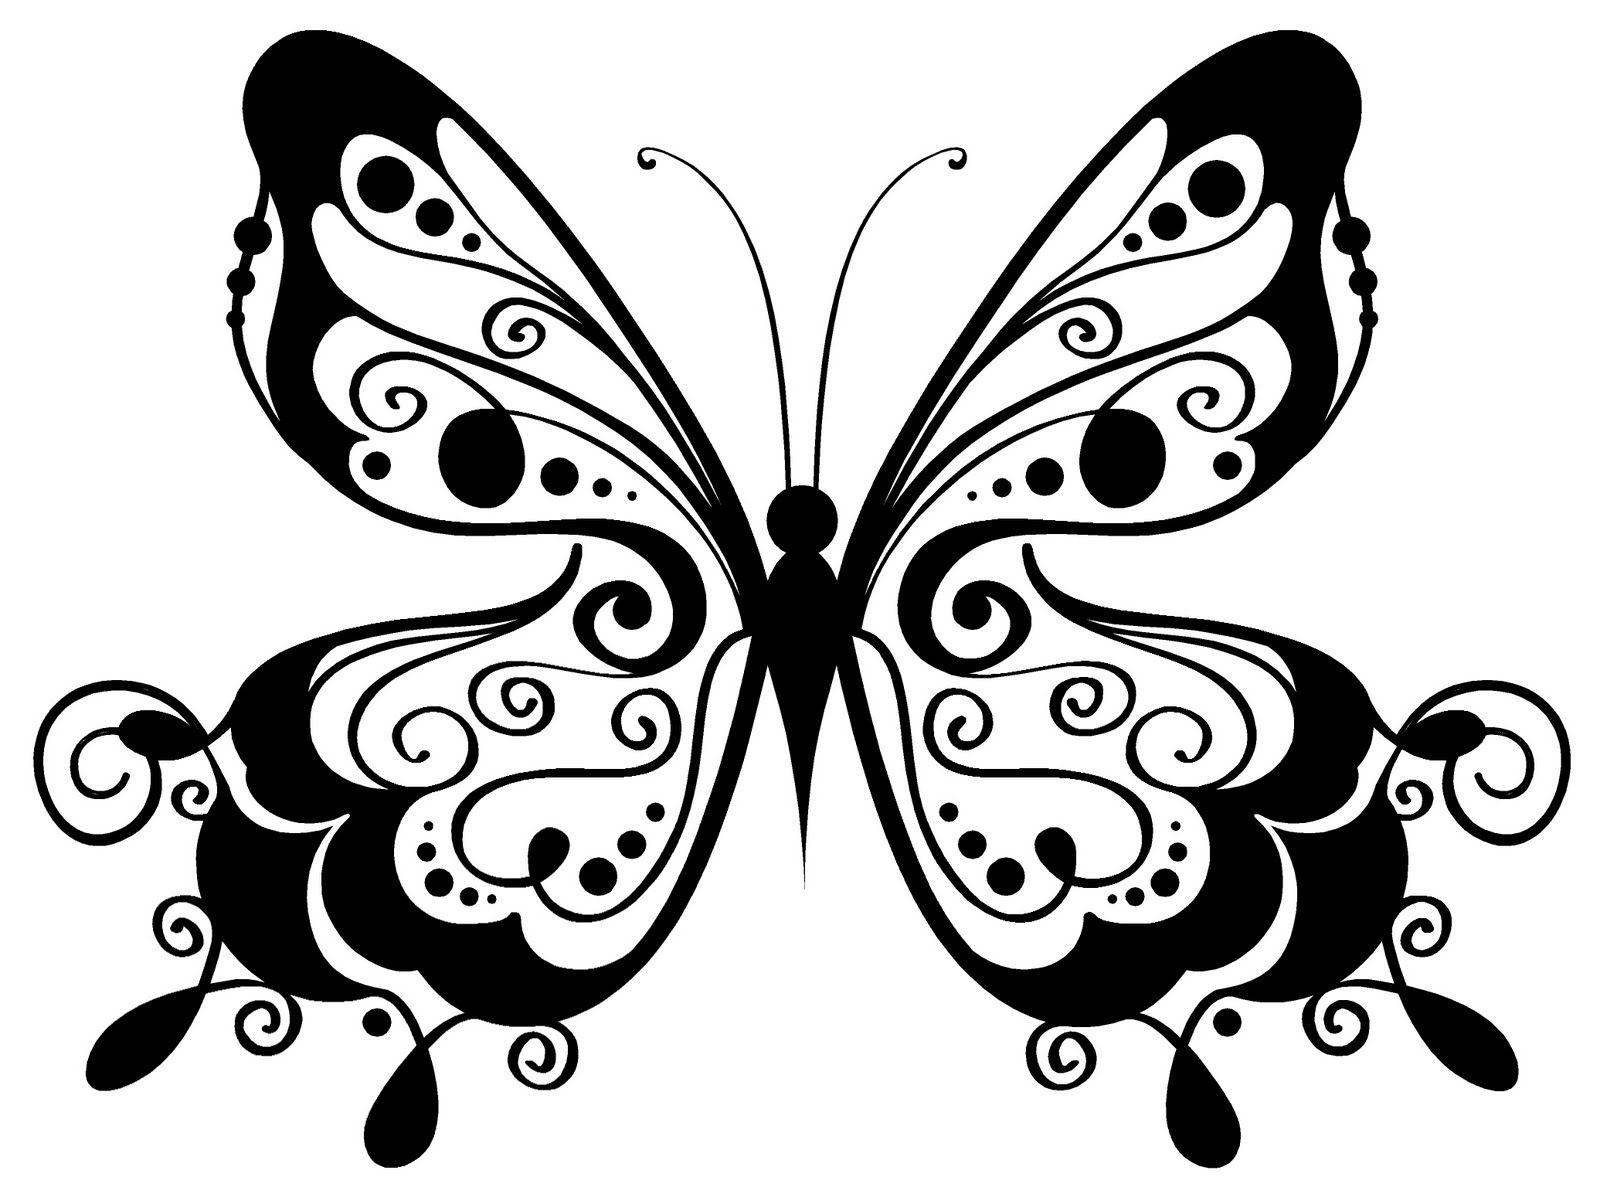 mariposa para color | Butterfly | Pinterest | Mariposas, Color y ...